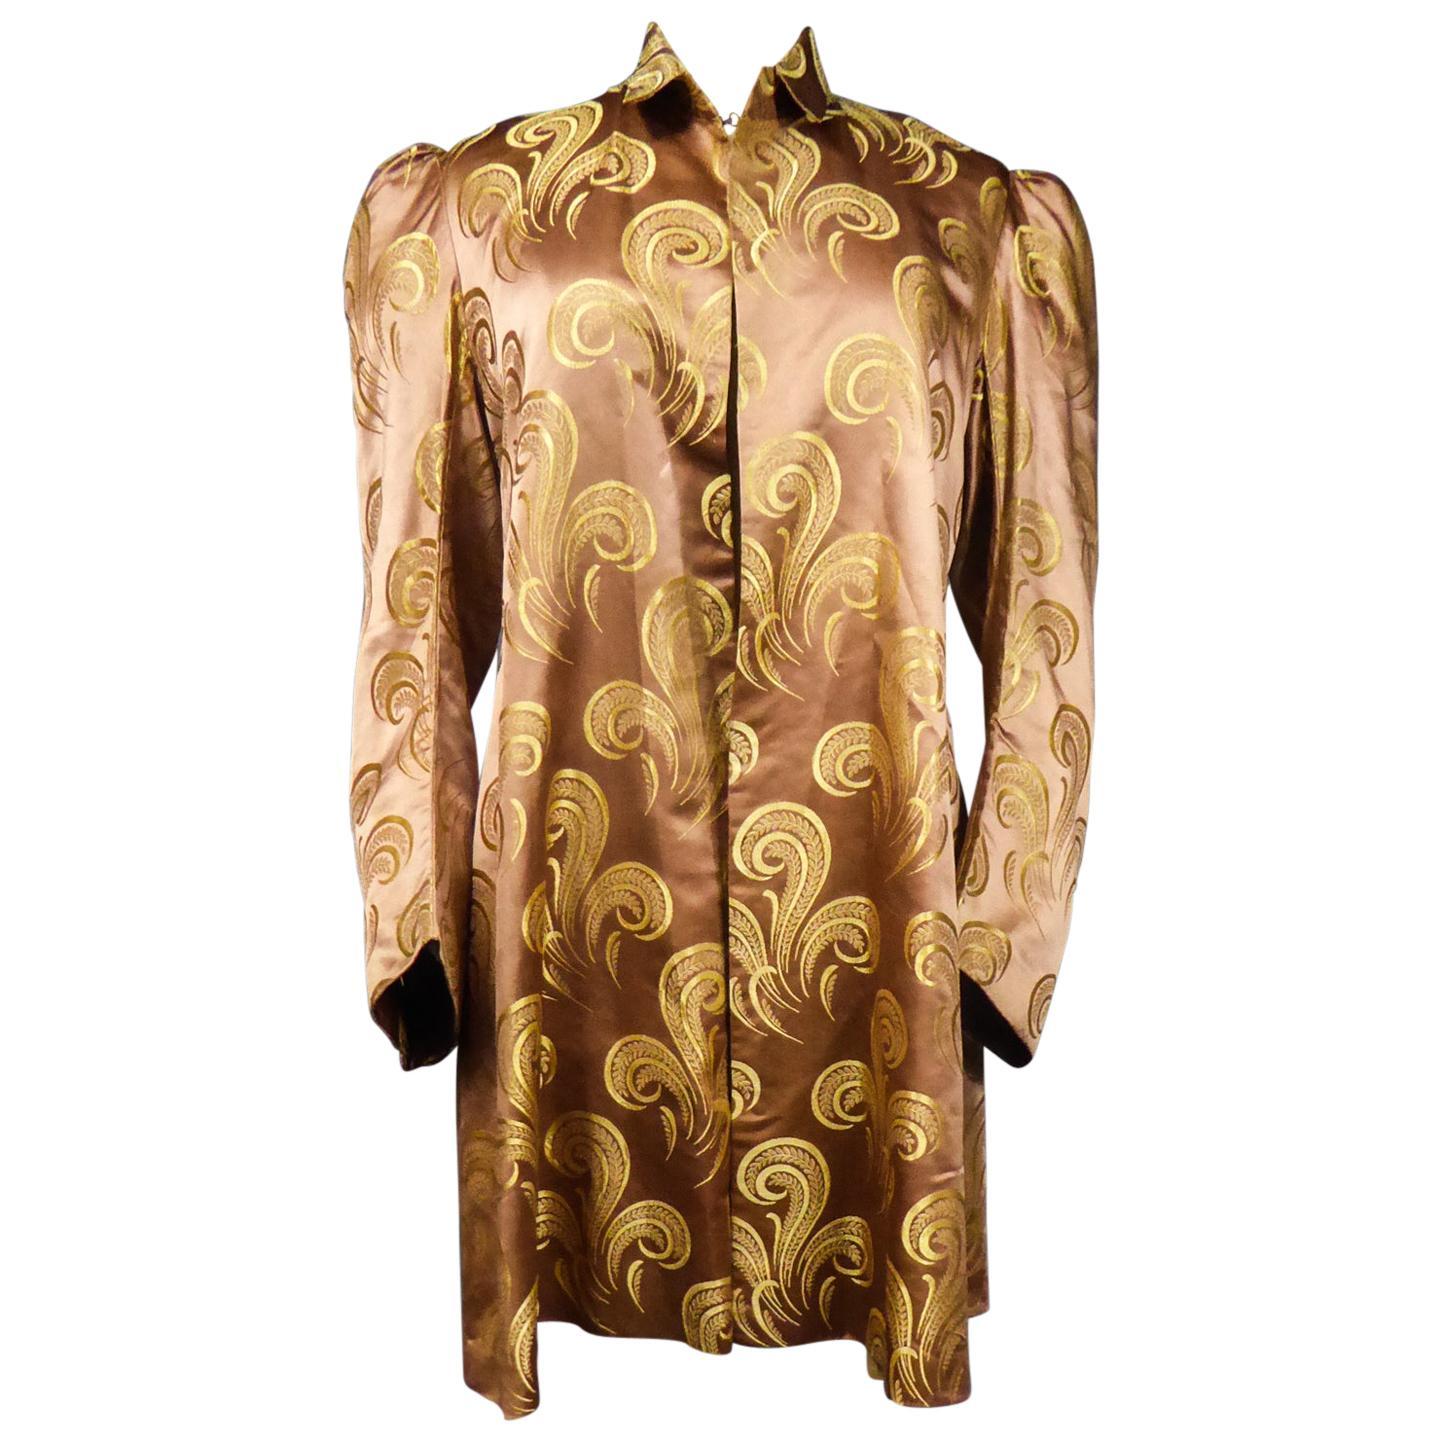 A Brocaded Satin Silk Evening Jacket Circa 1930/1950